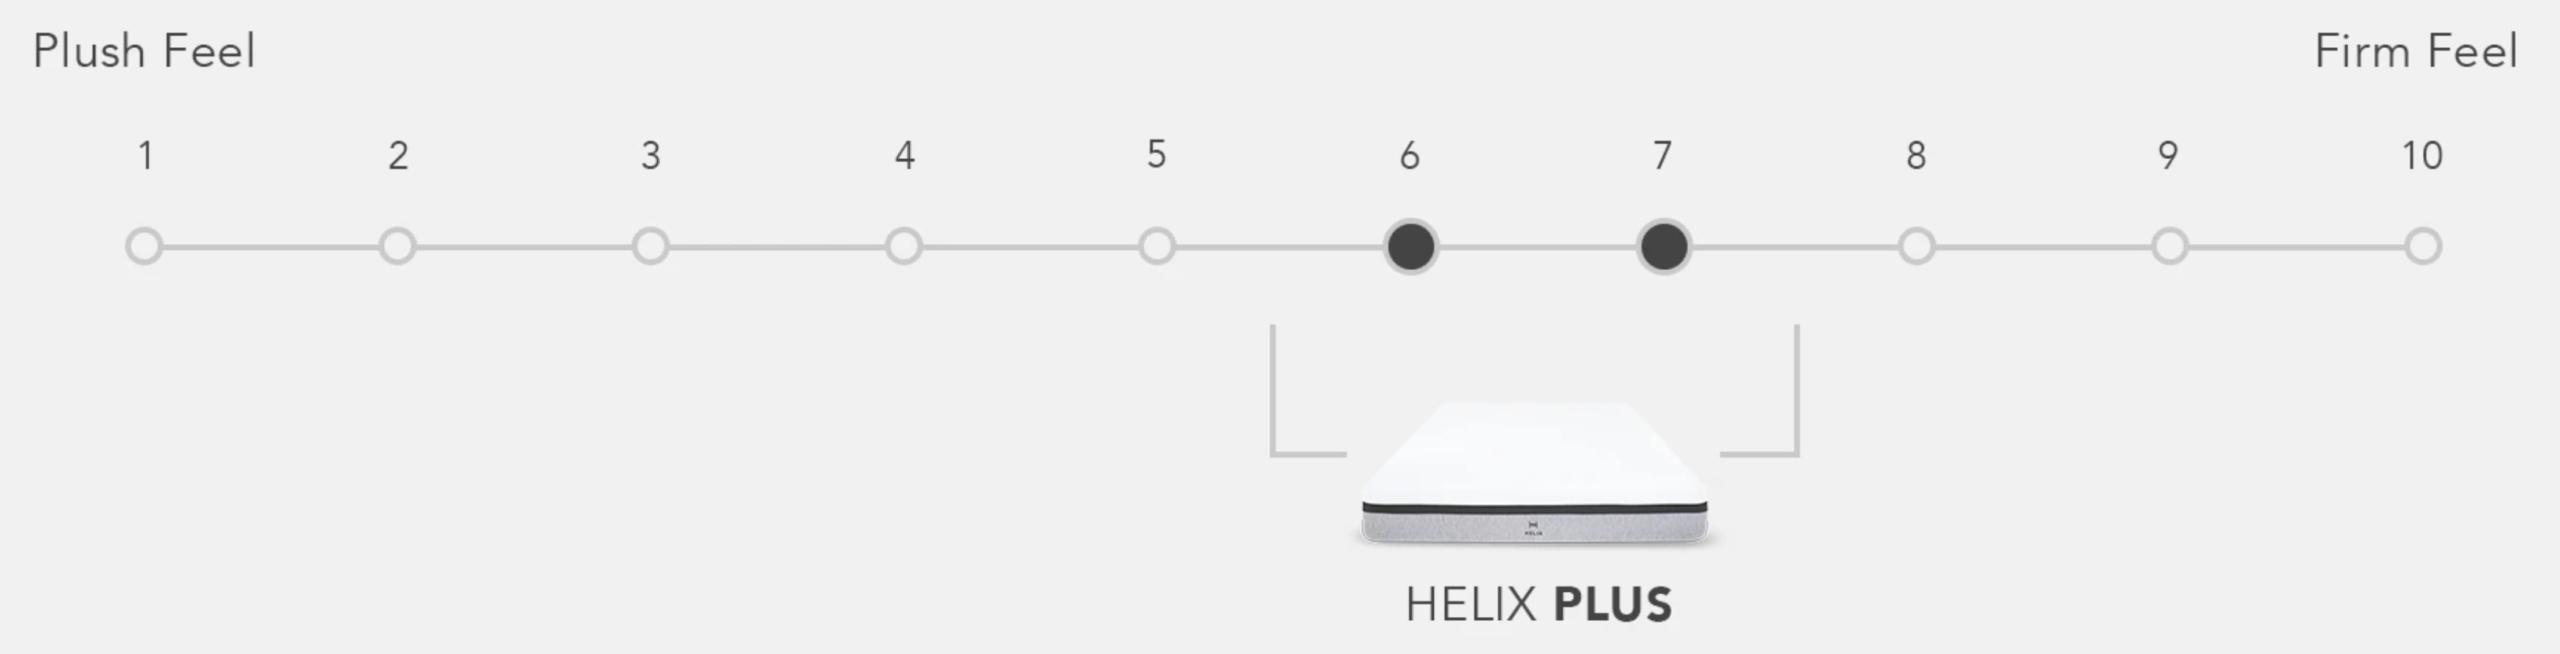 helix plus comfort